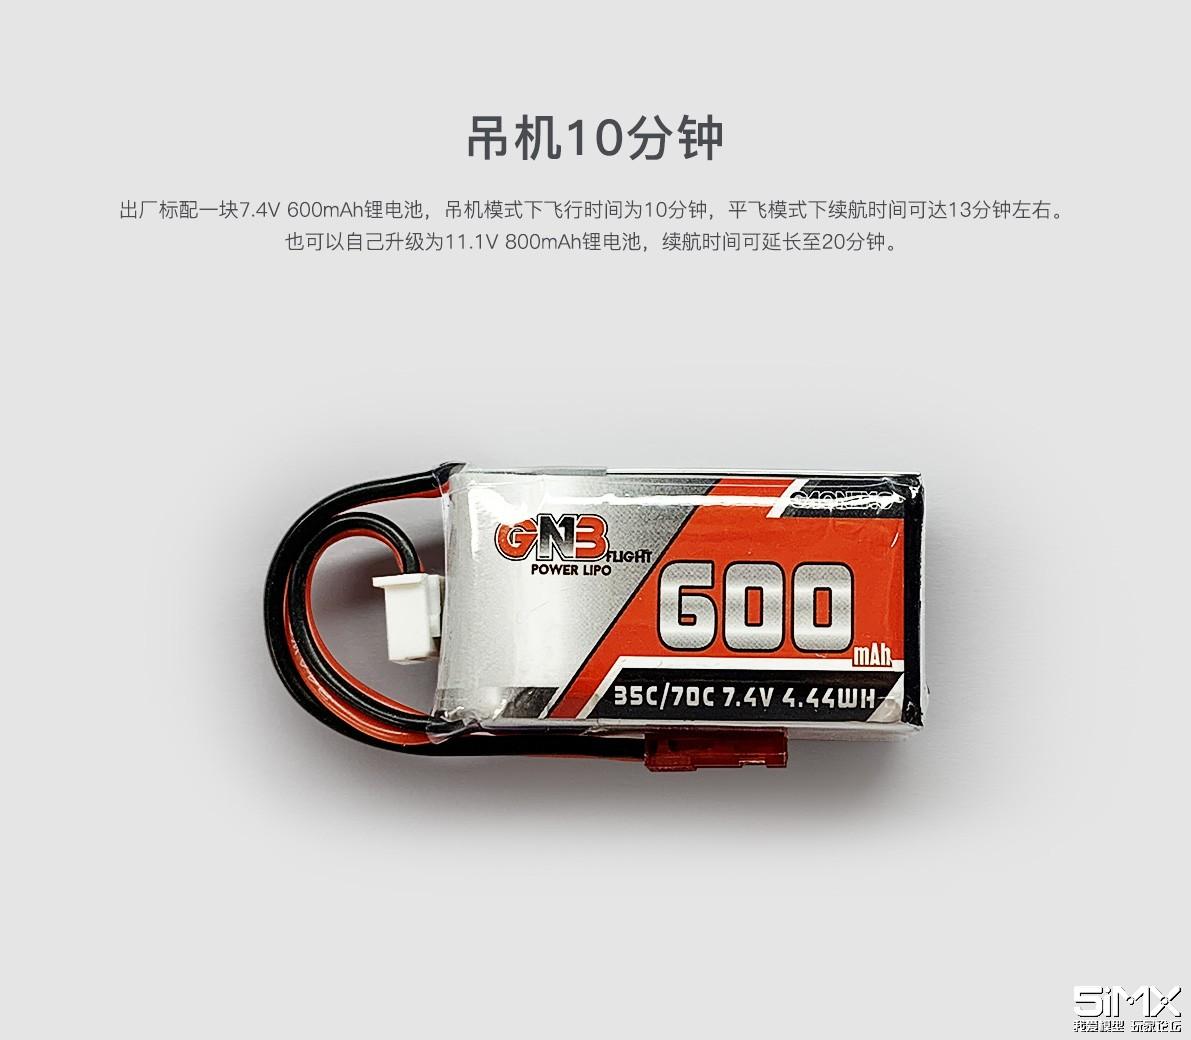 3D固定翼(中文)_07-1.jpg